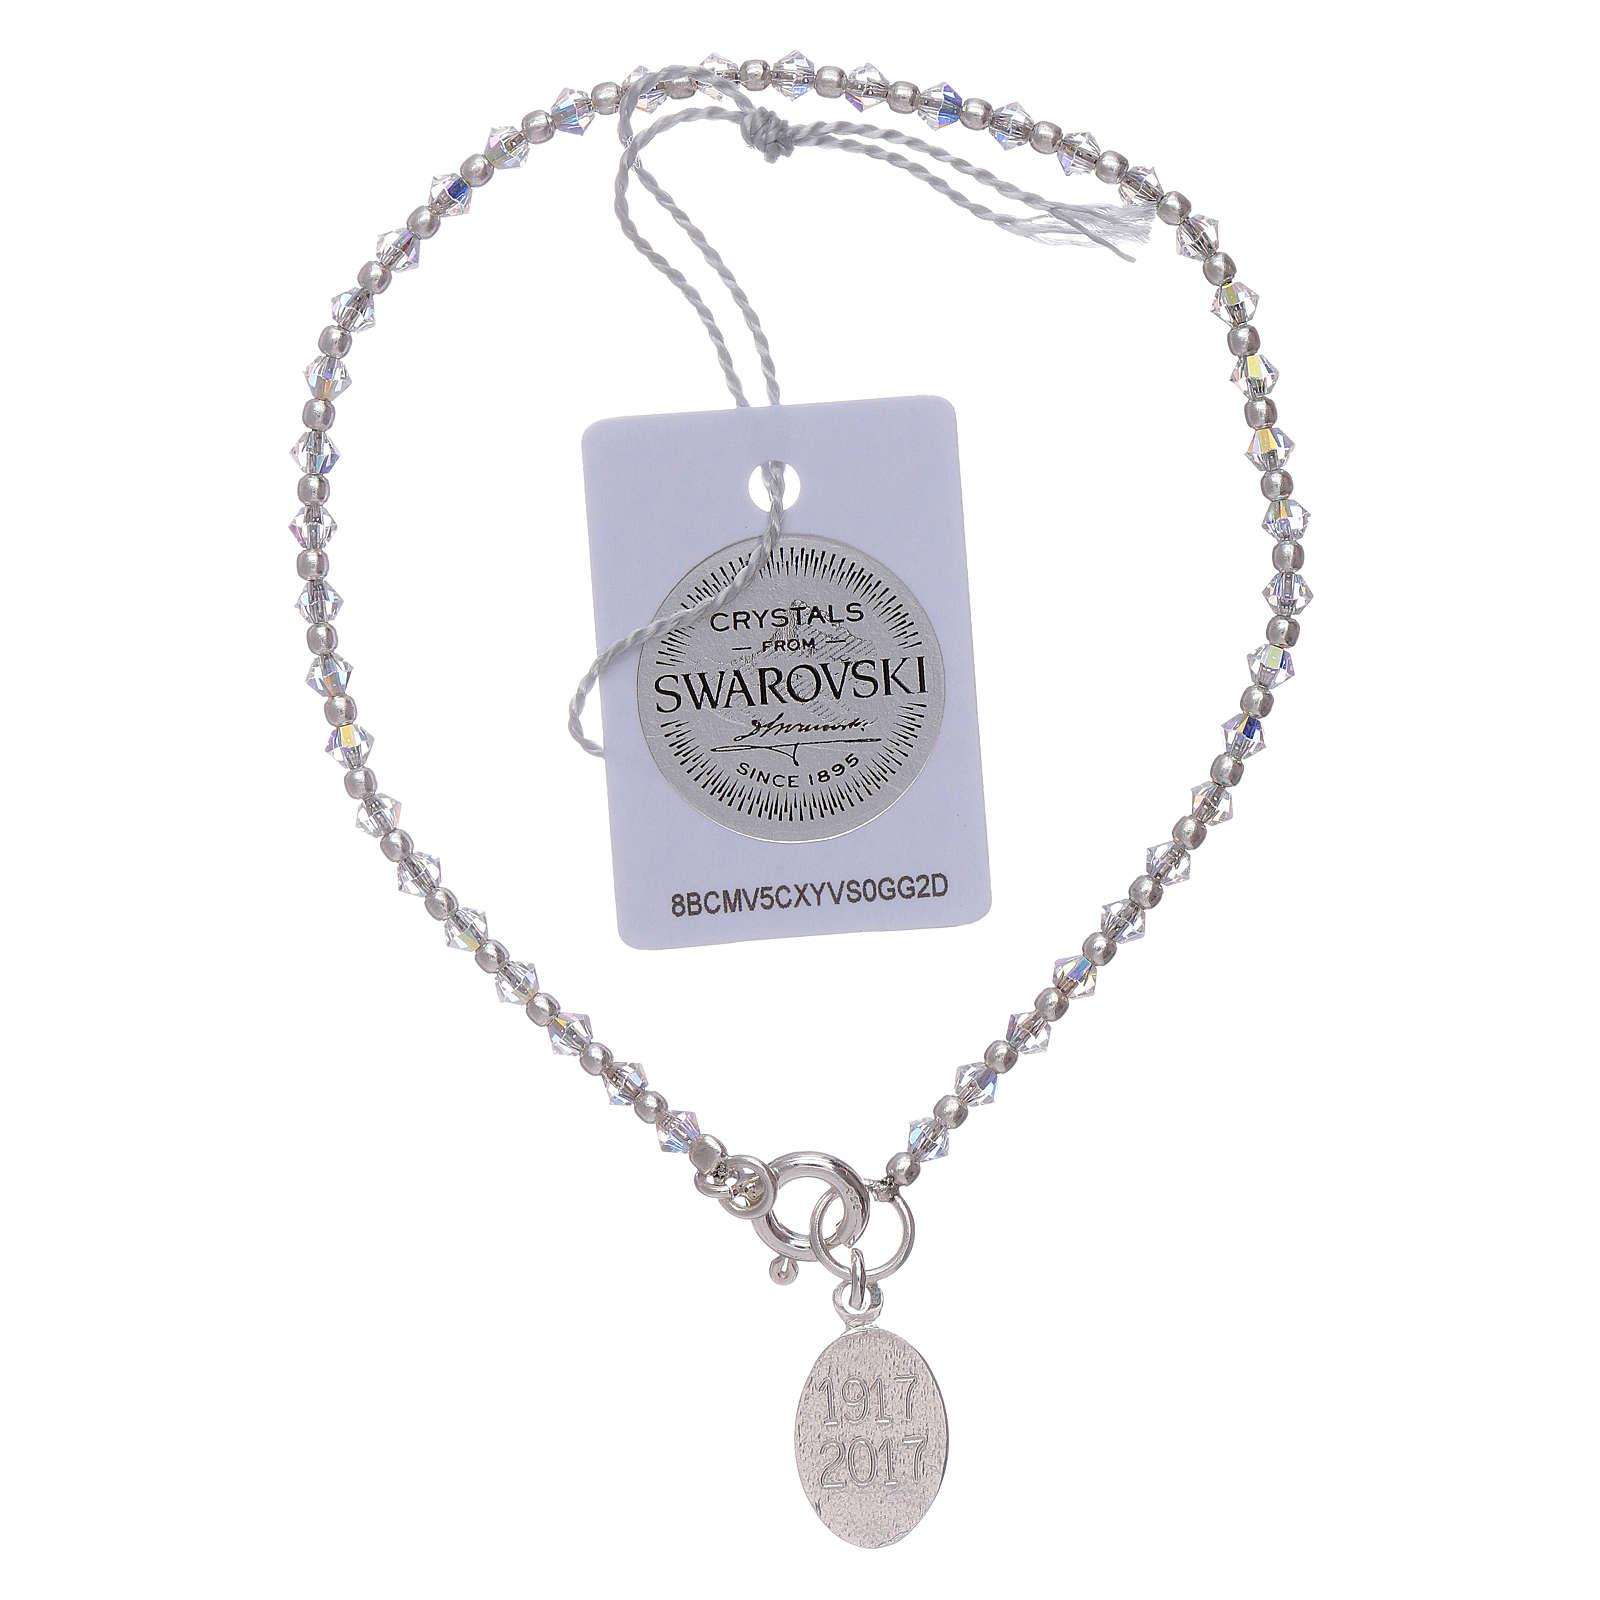 Our Lady of Fatima bracelt with Swarovski and silver beads 4